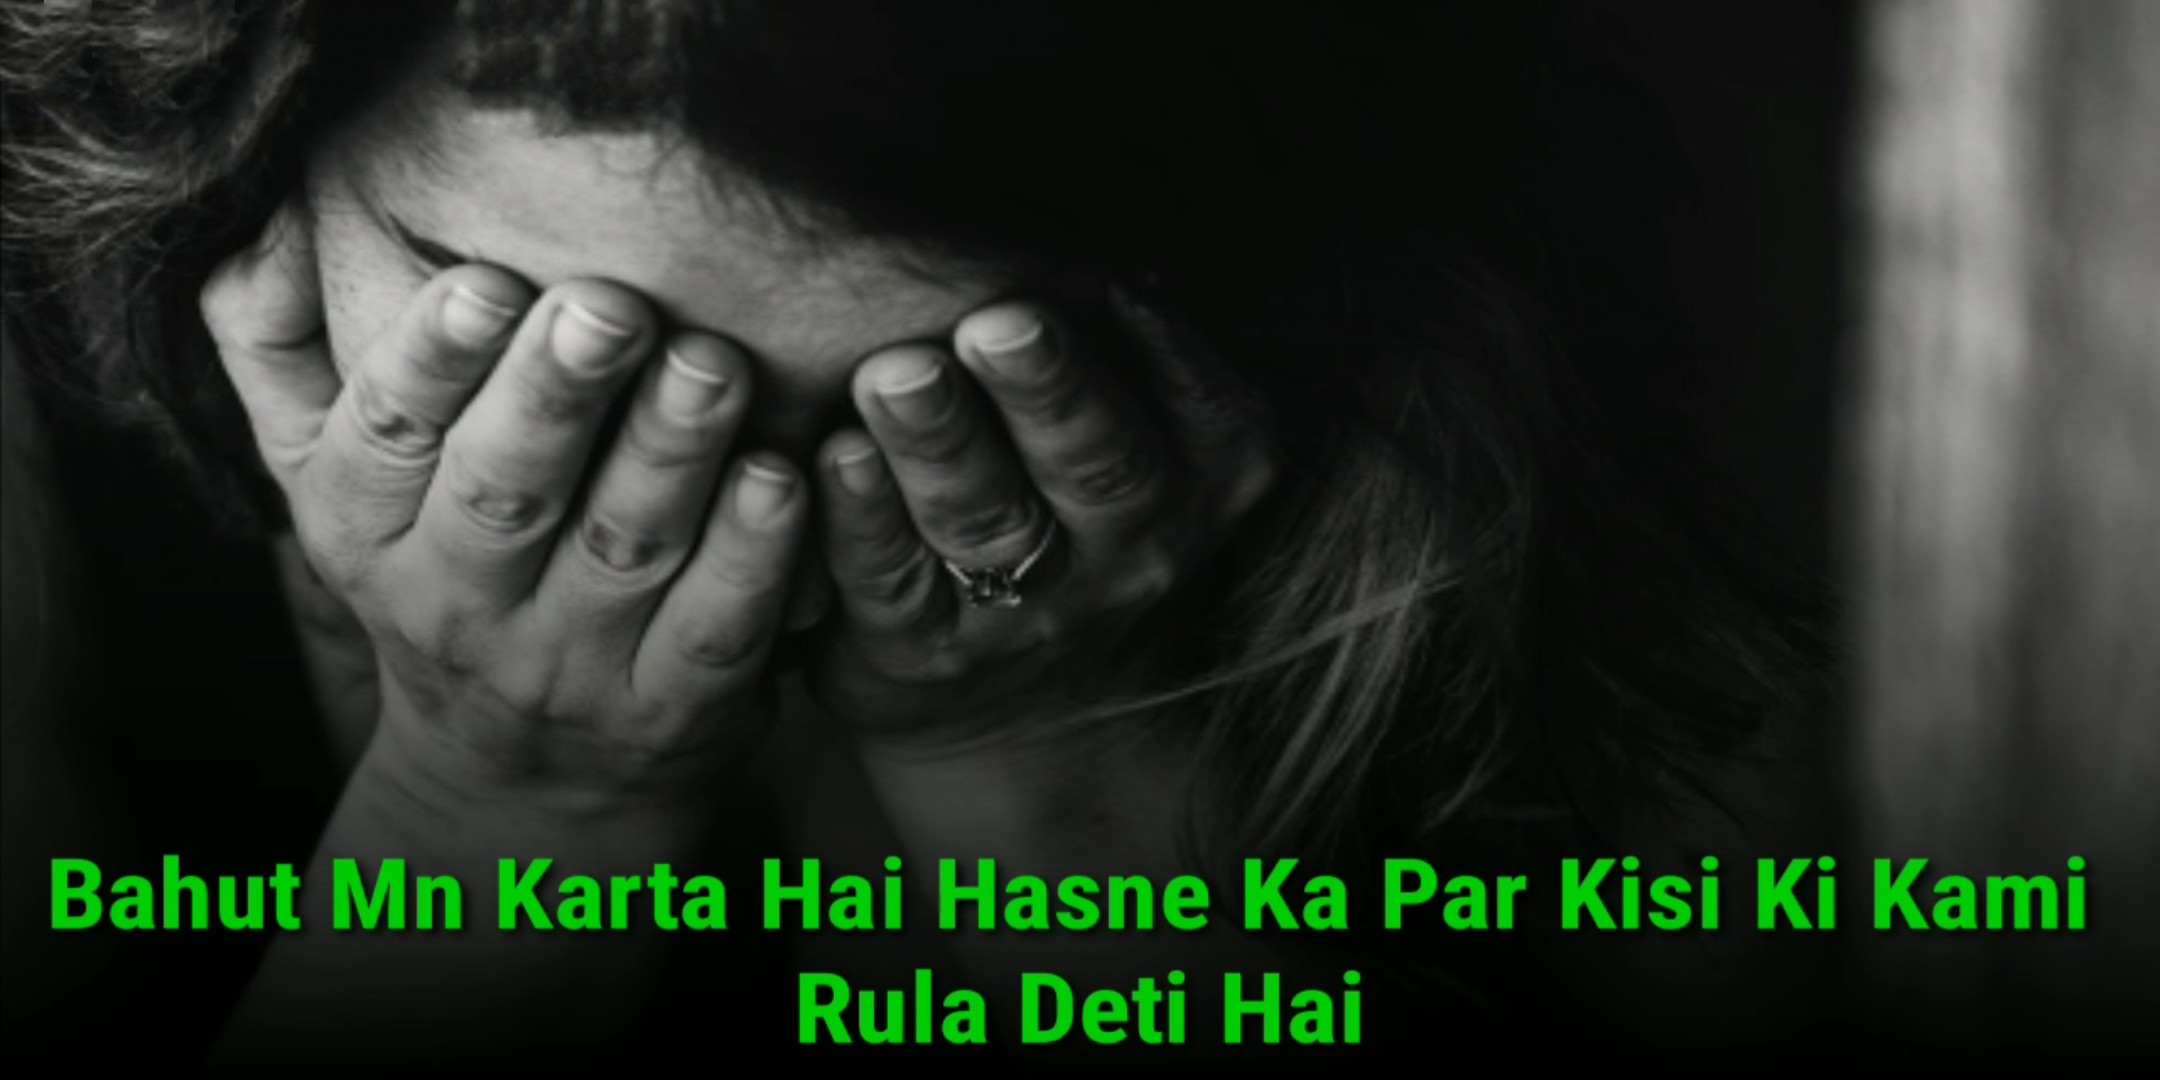 Sad Shayari Hindi Mai Image Download